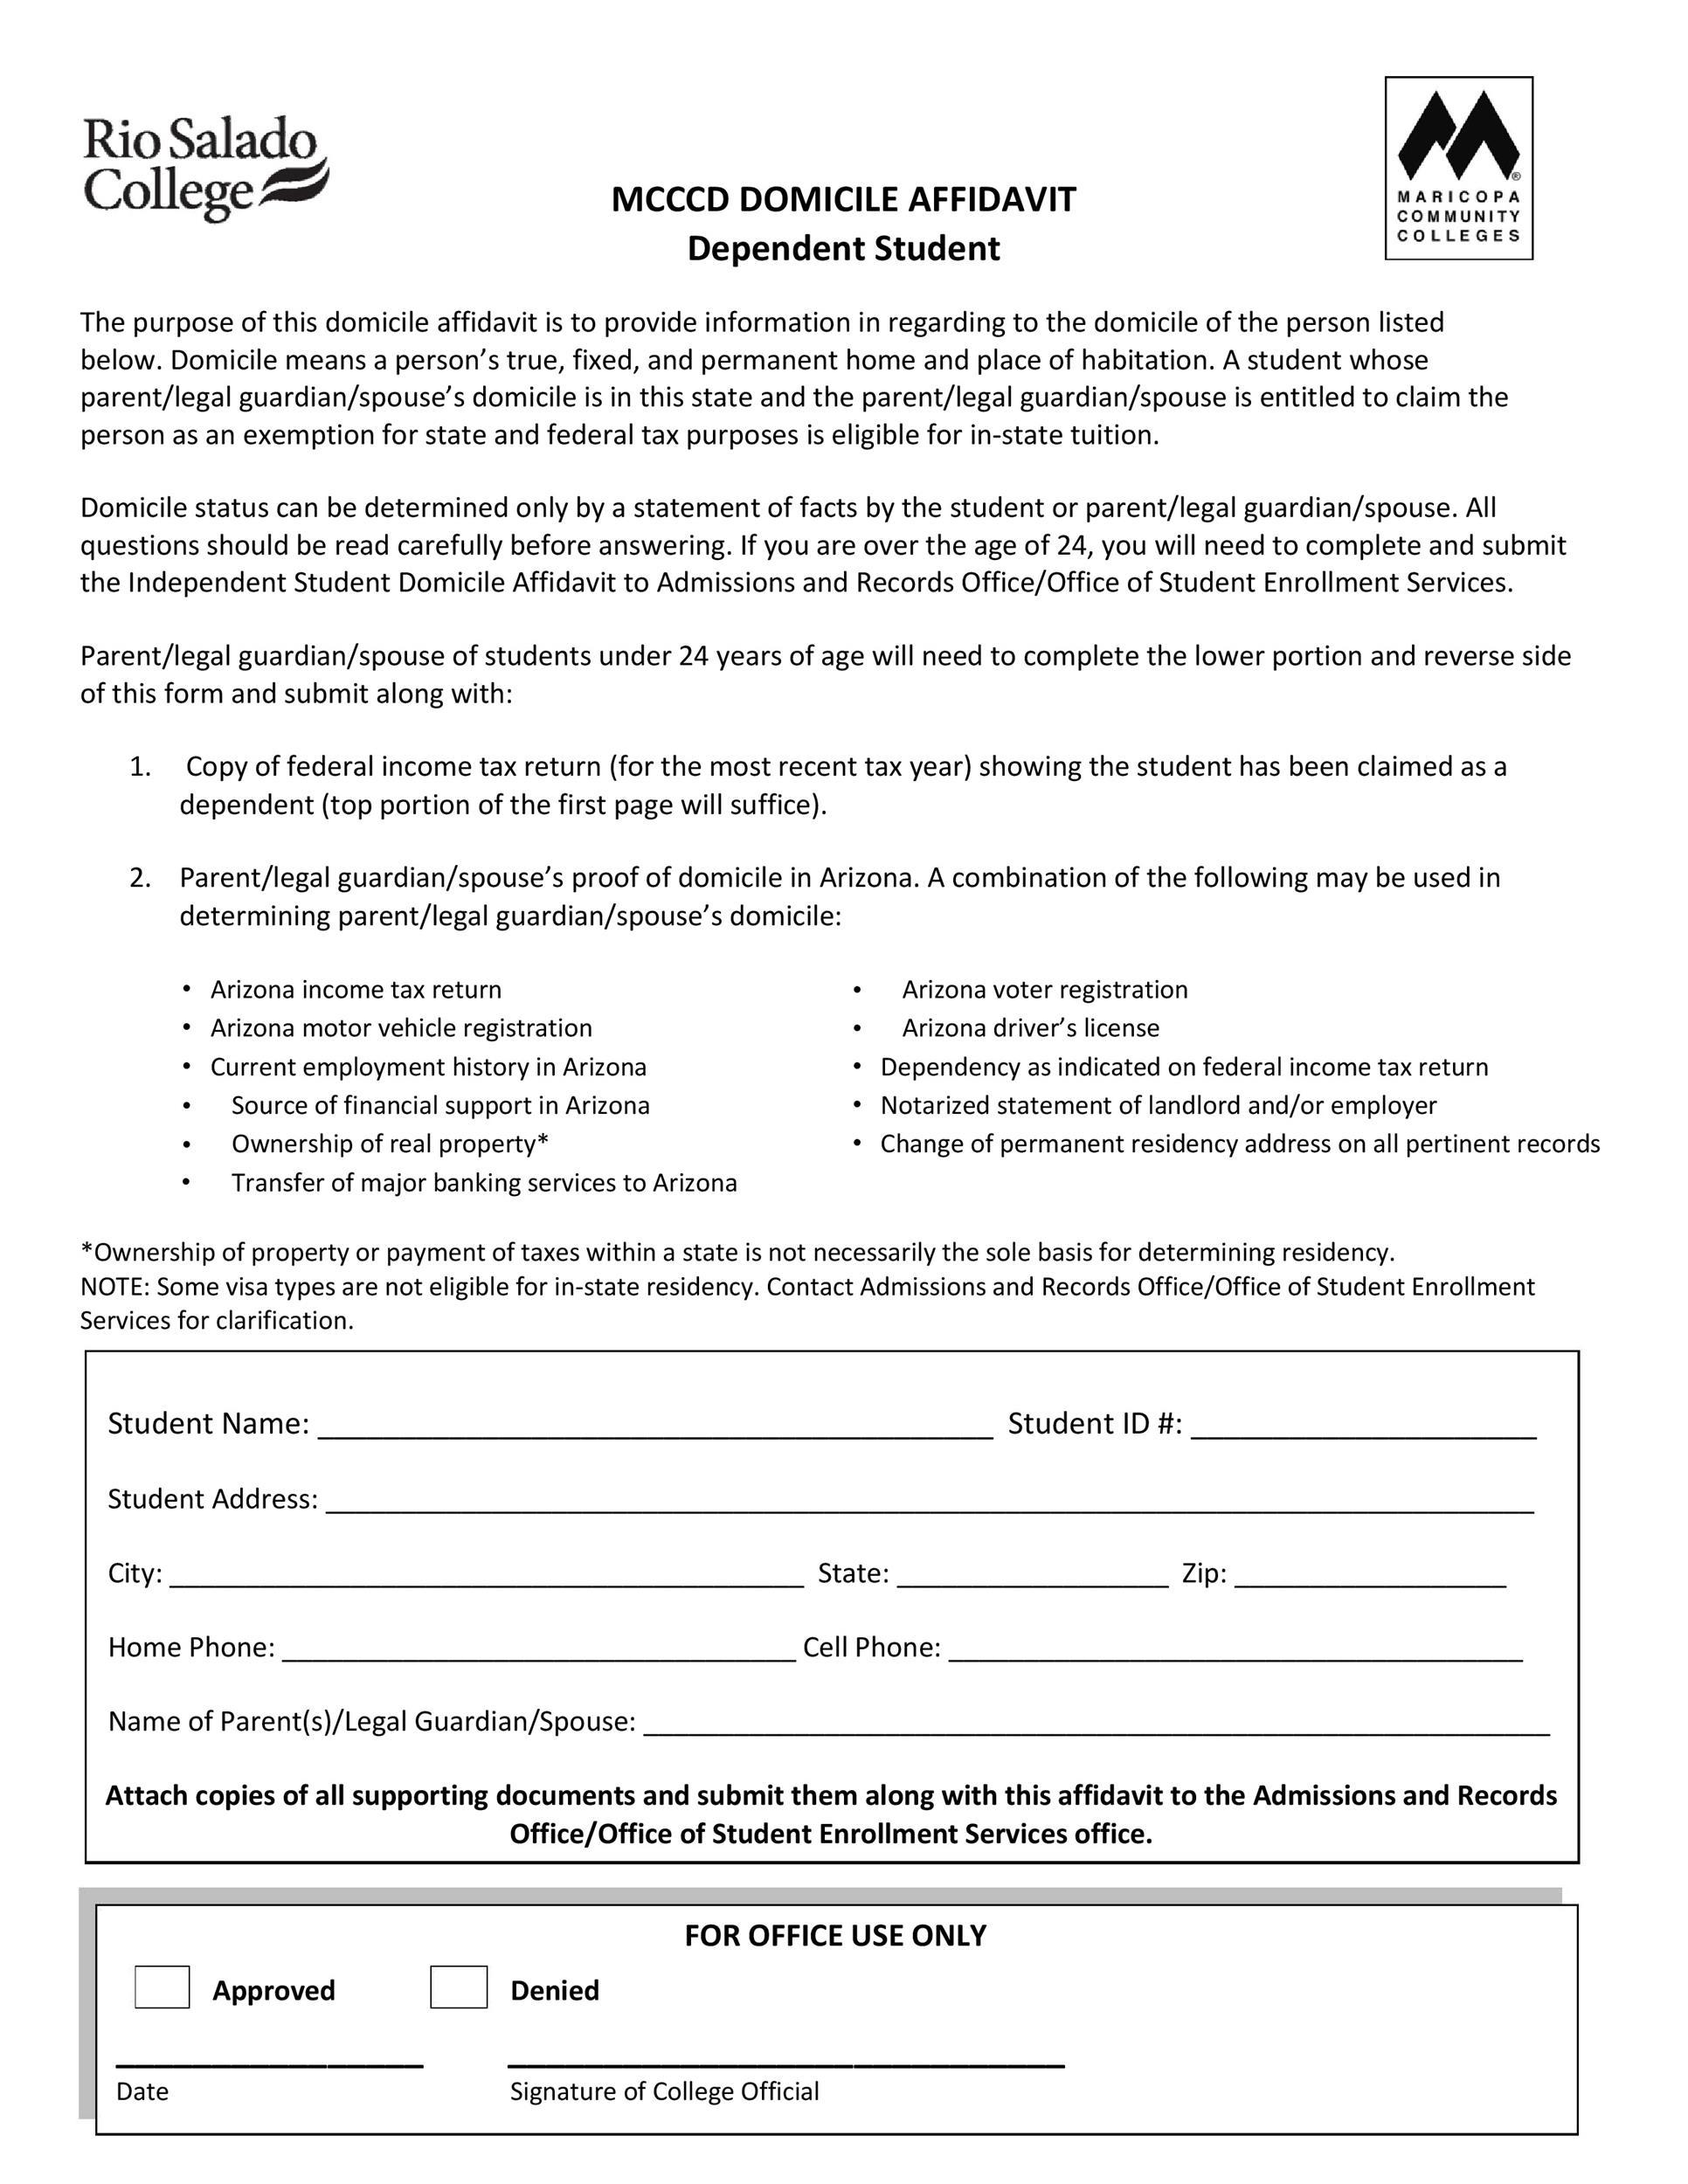 Free affidavit of domicile 28